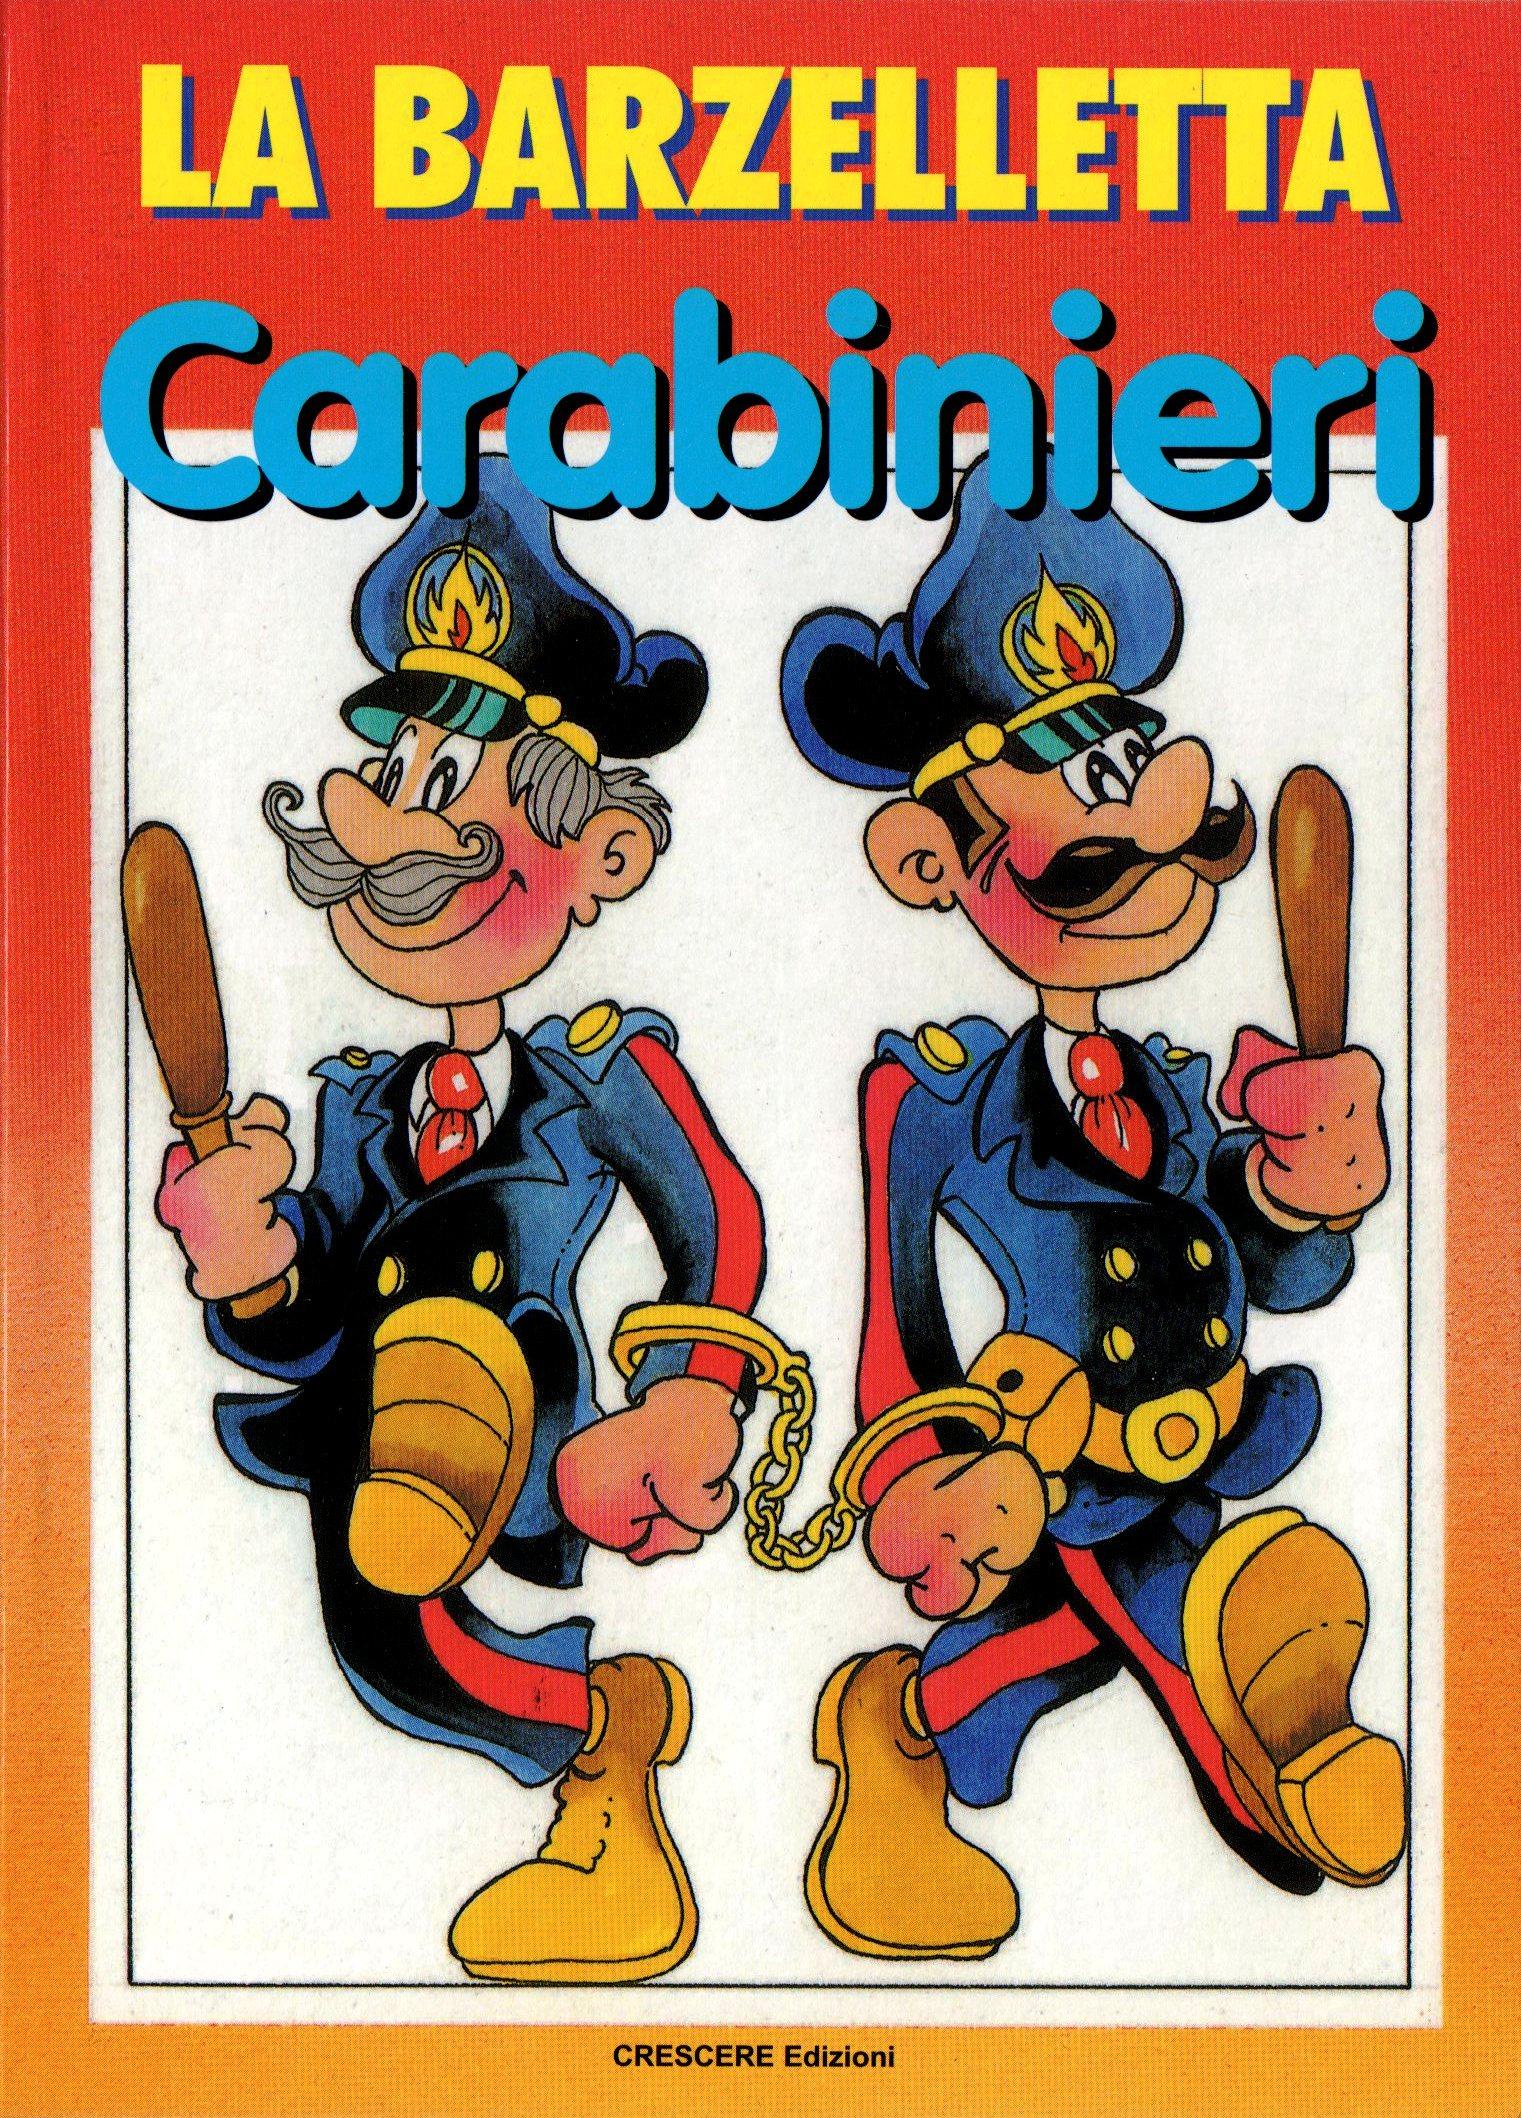 La barzelletta. Carabinieri.